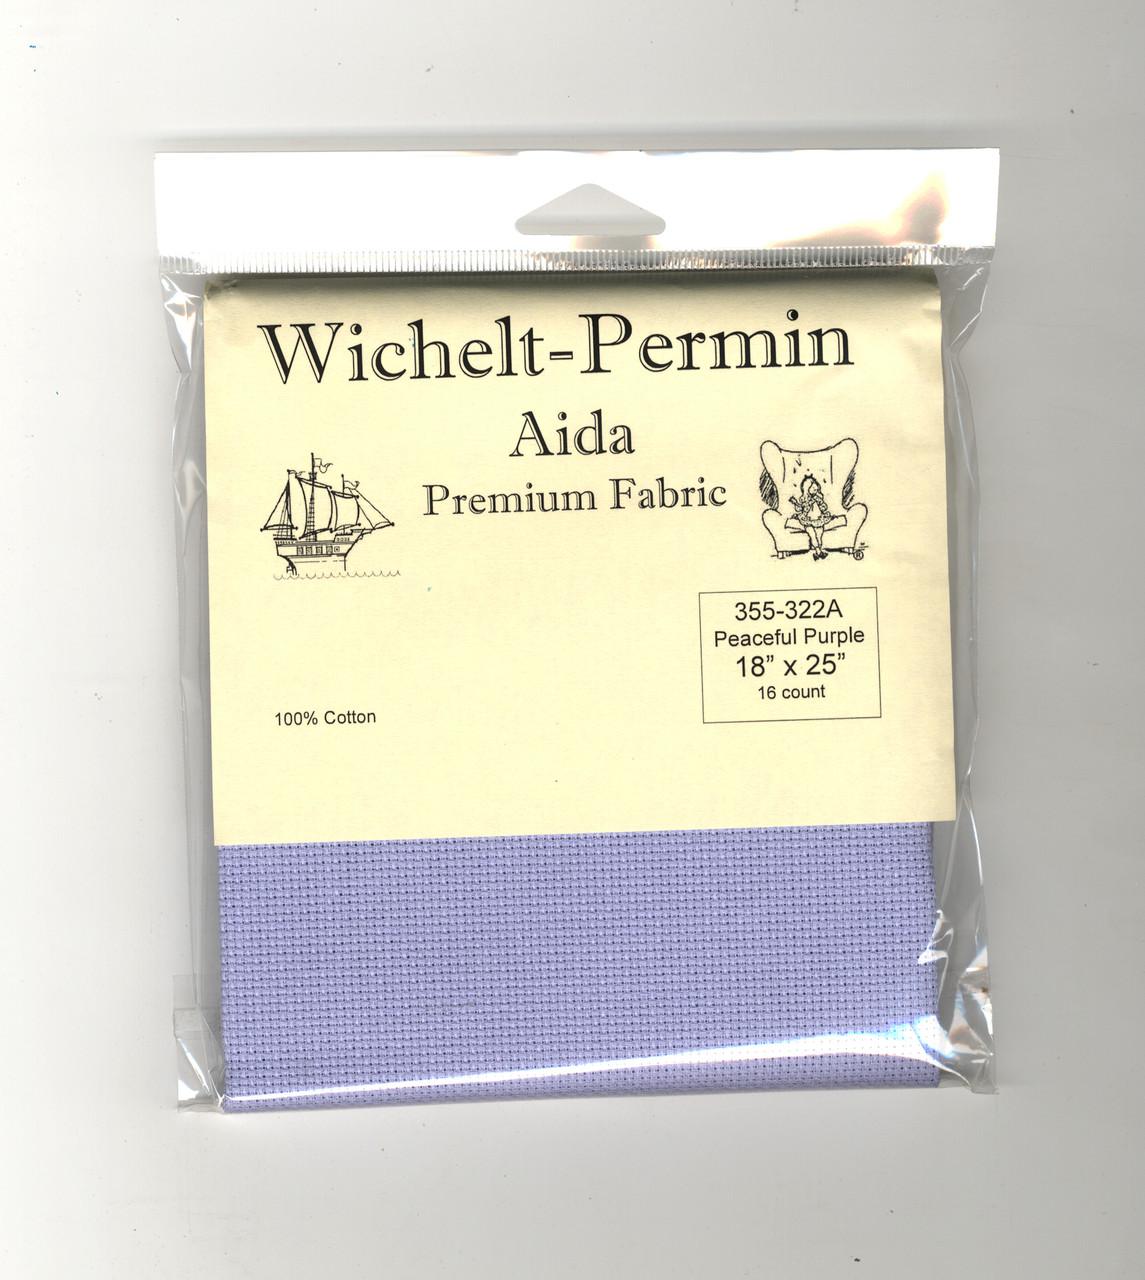 "Wichelt - 16 Count Peaceful Purple Aida 18"" x 25"""